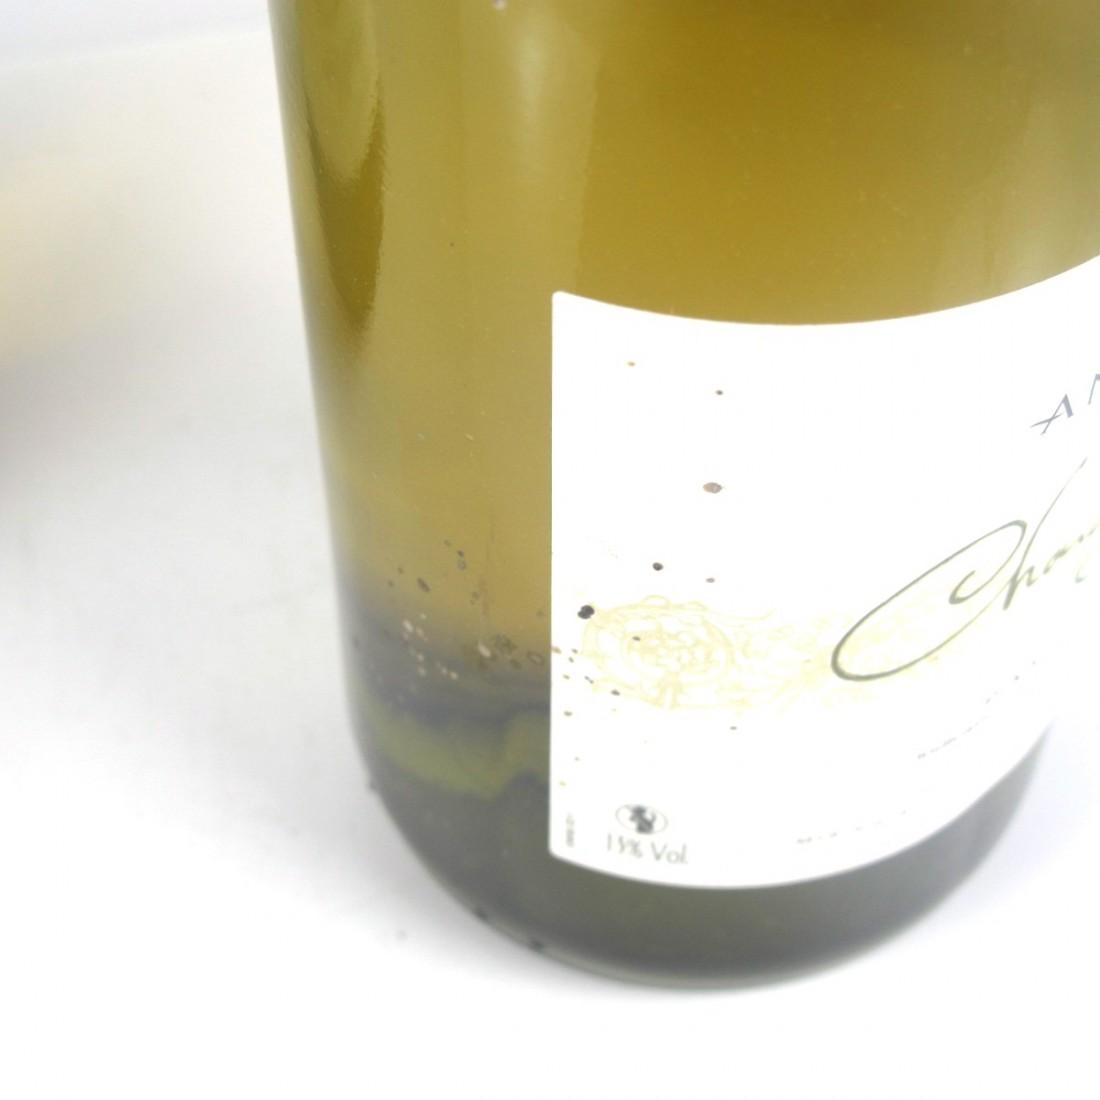 Antech Chardonnay 2012 Pays d'Oc 2x75cl